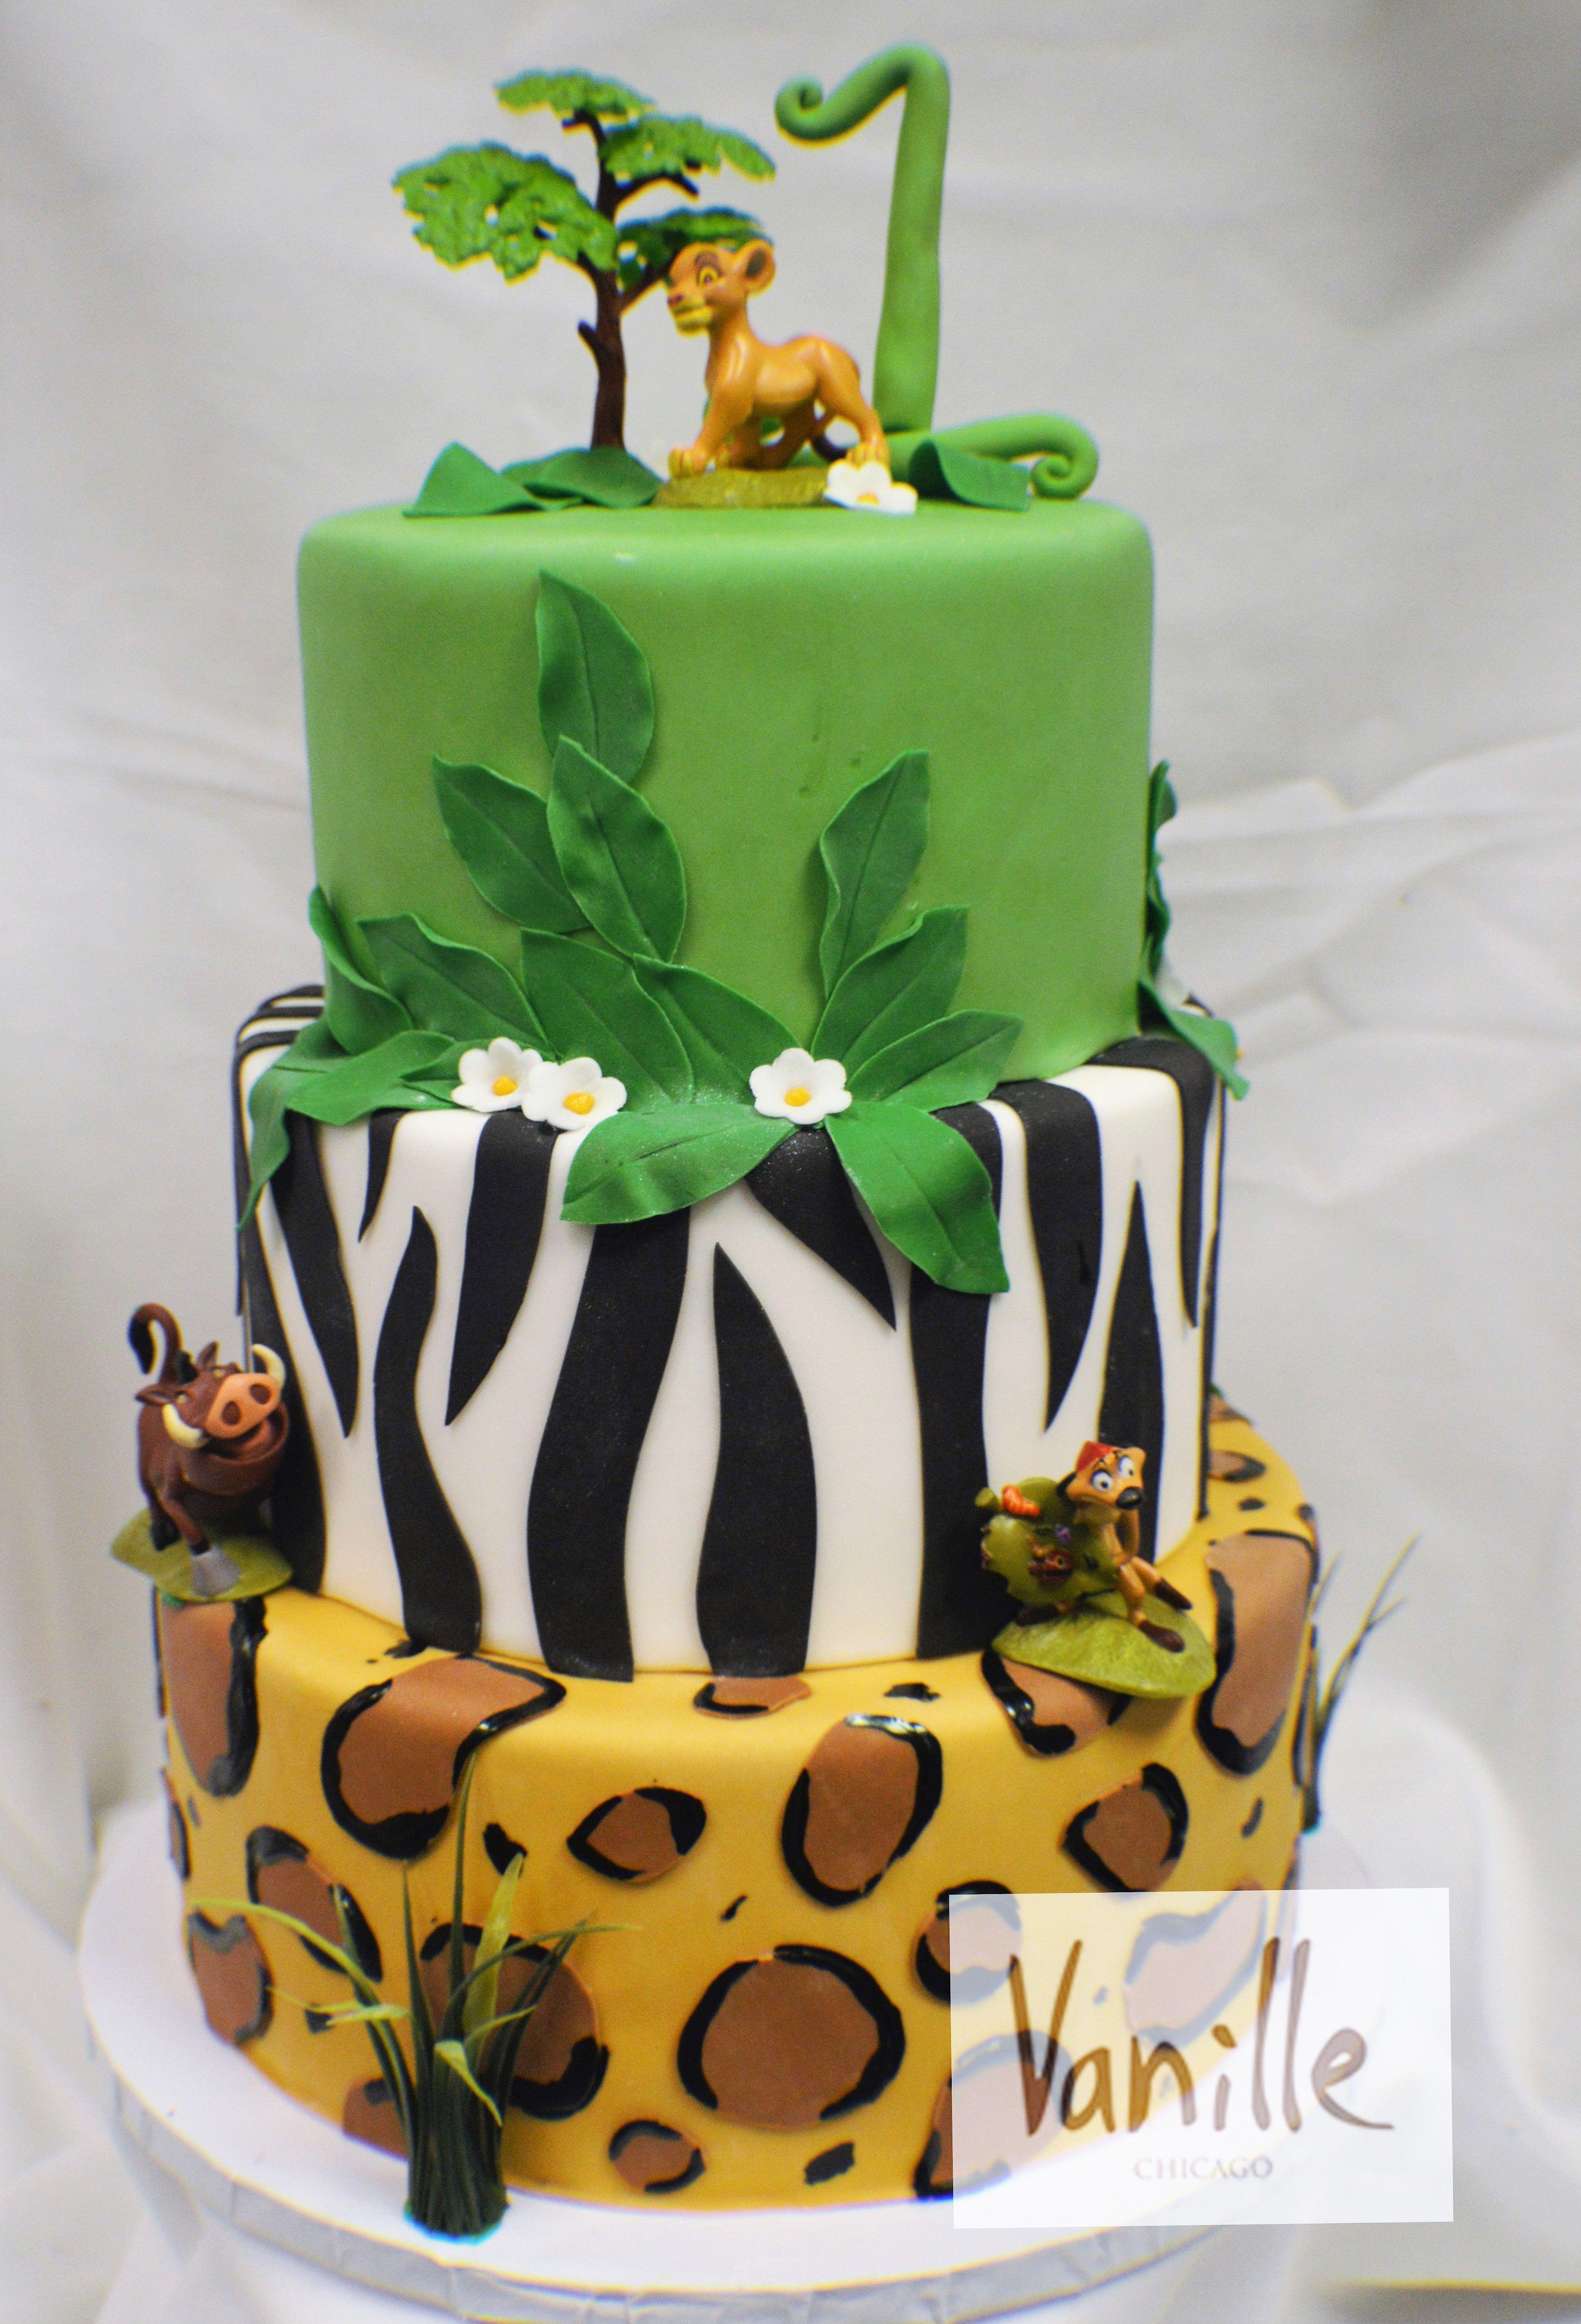 vanille chicago lion king safari birthday cake vck64 vanille on minnie mouse birthday cakes chicago